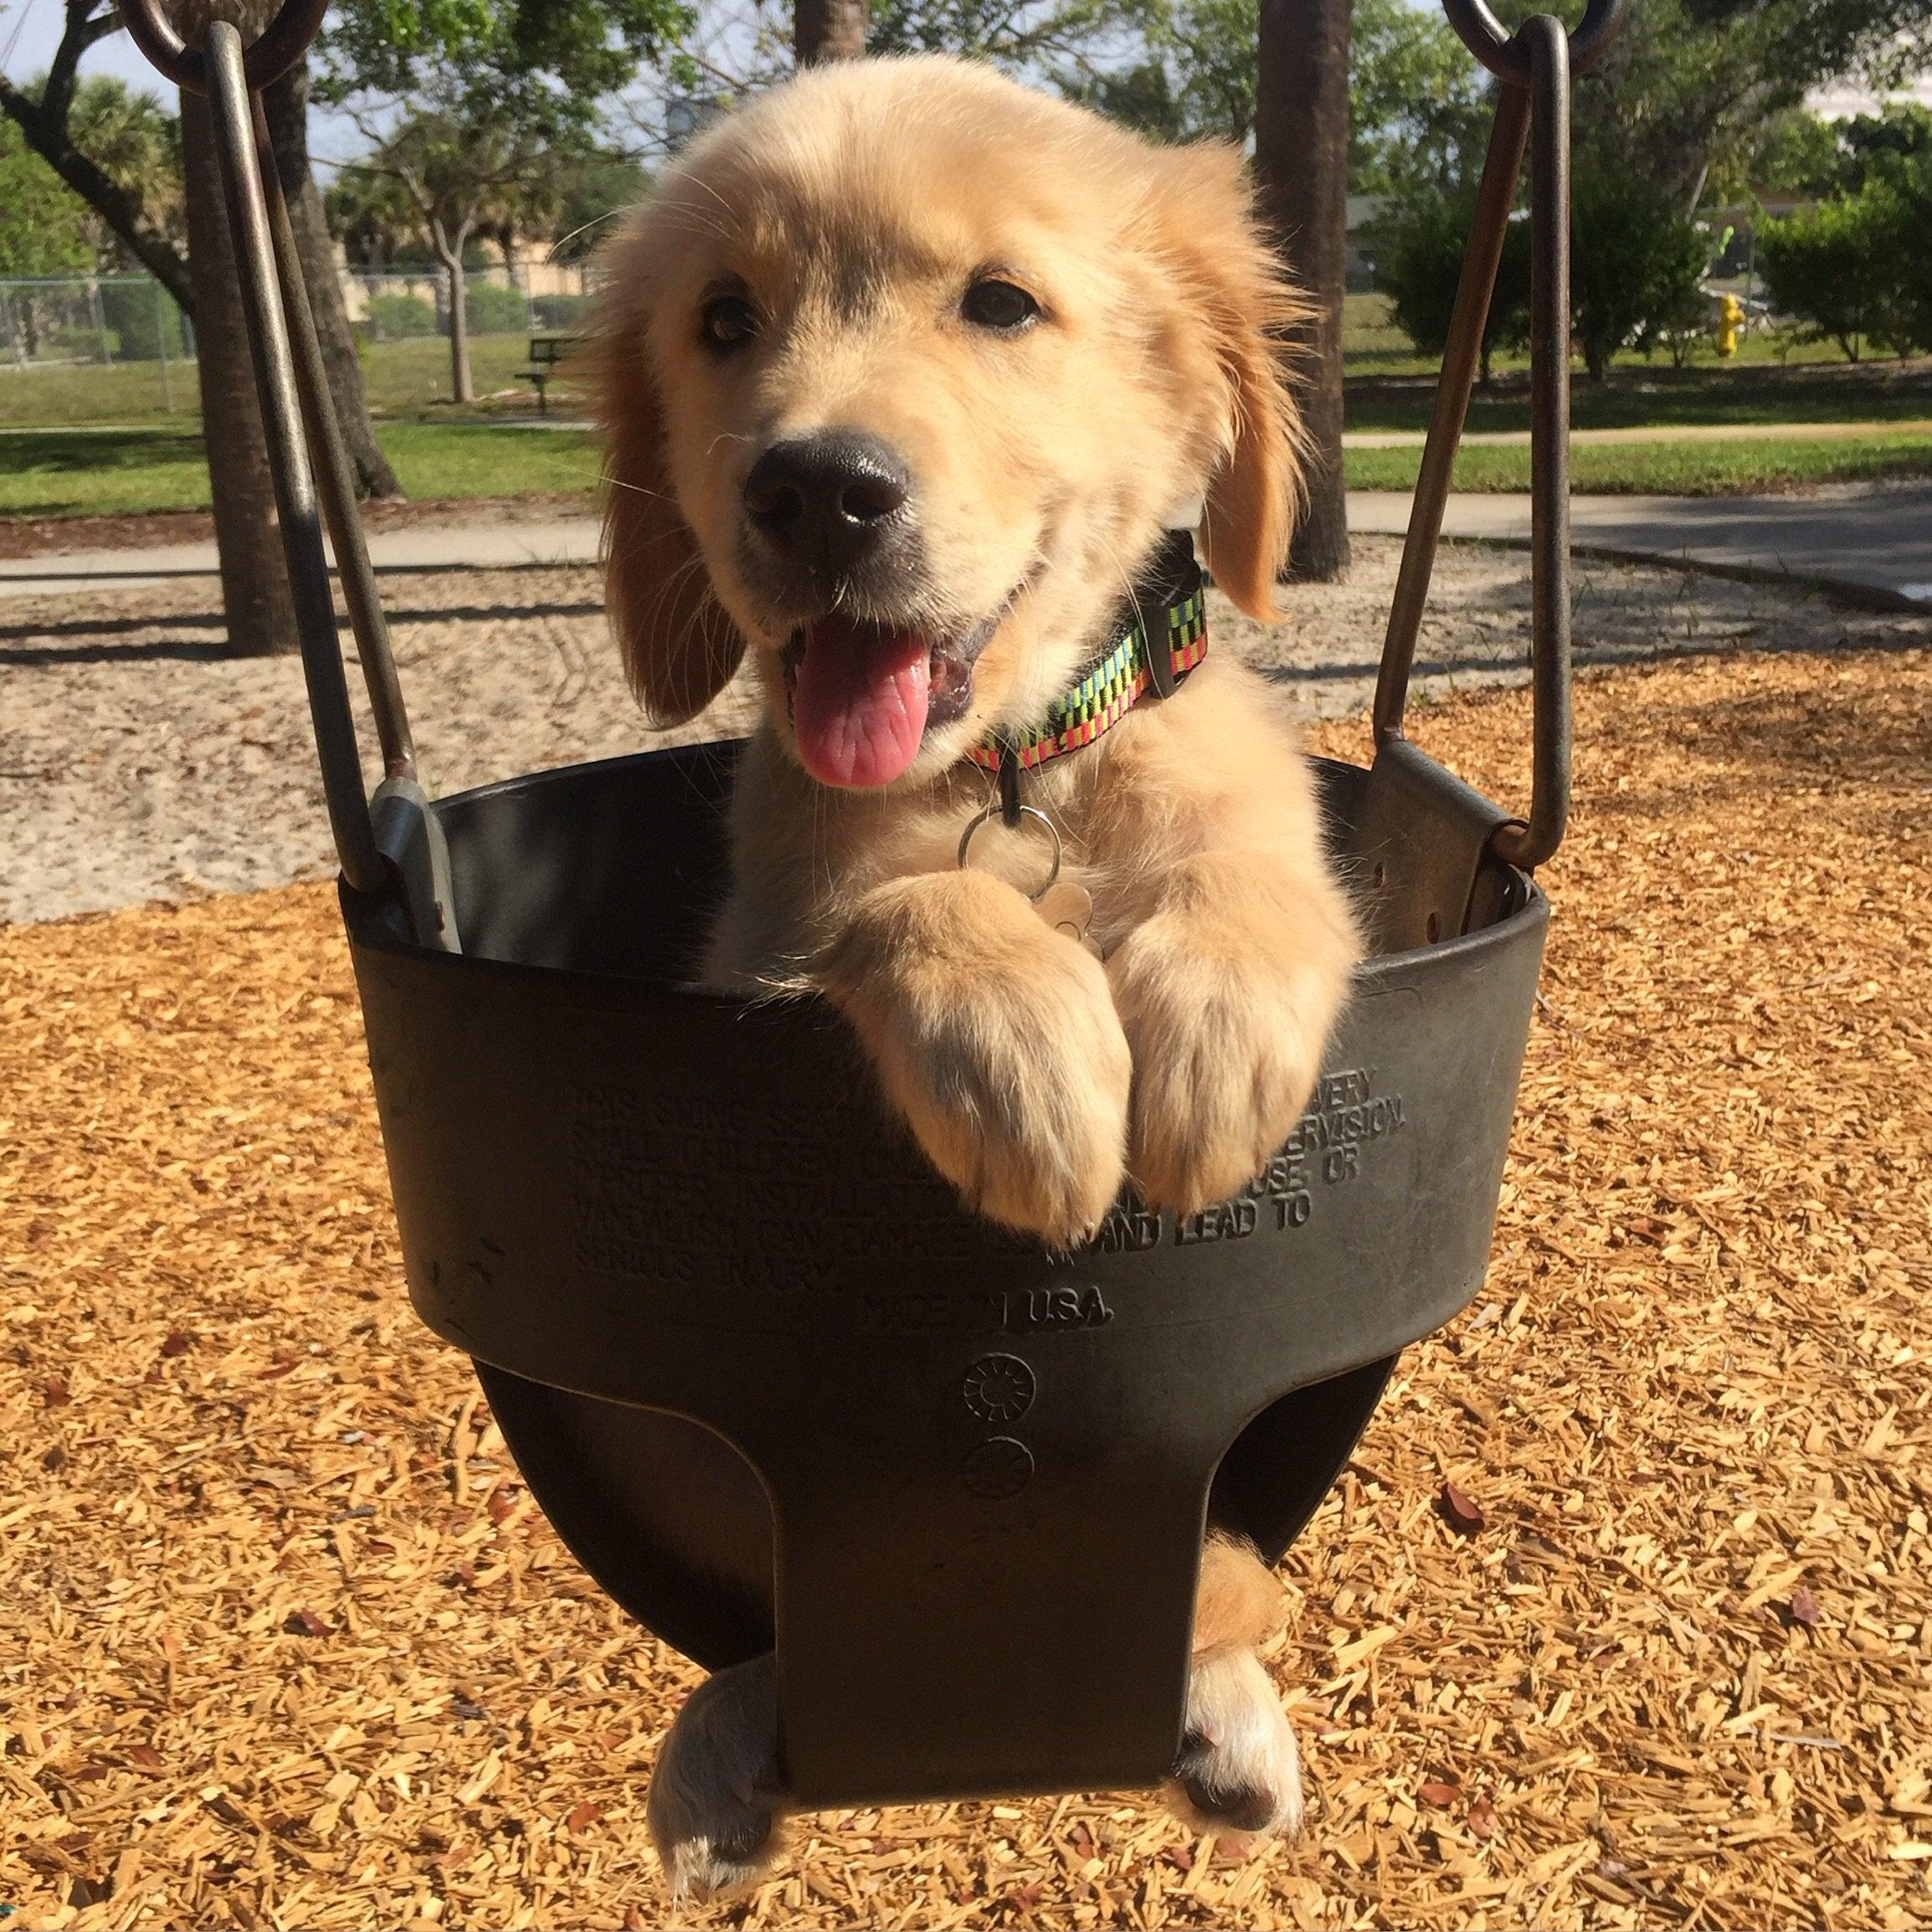 The CUTEST Golden Retriever Puppies You#8217;ve EVER Seen! 2105784417